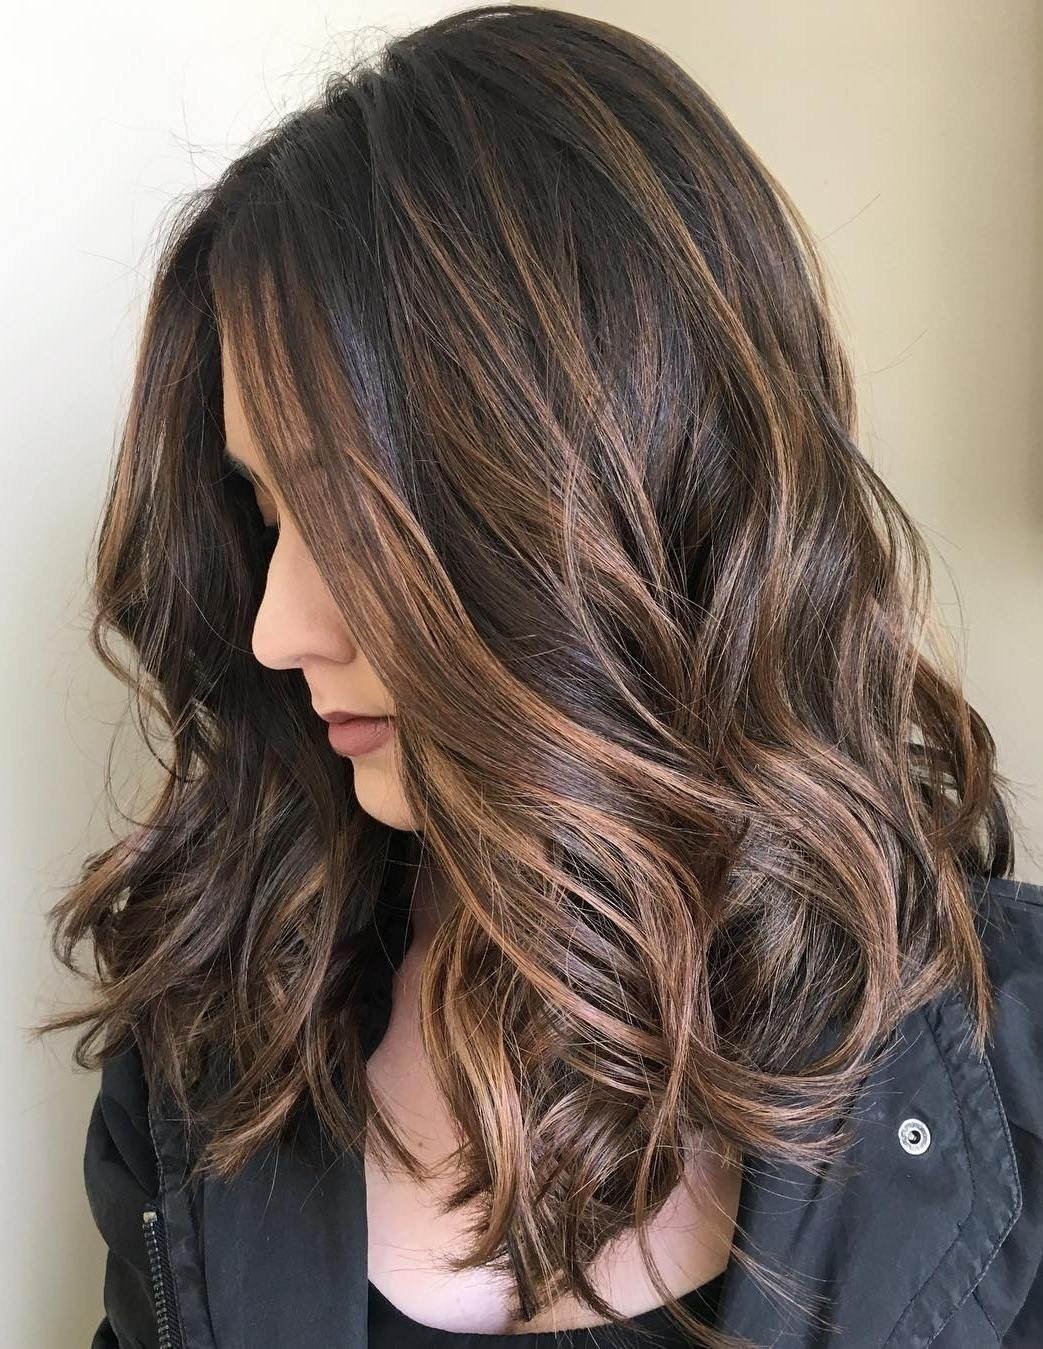 10 Stunning Hair Highlight Ideas For Brown Hair 70 flattering balayage hair color ideas for 2018 3 2020